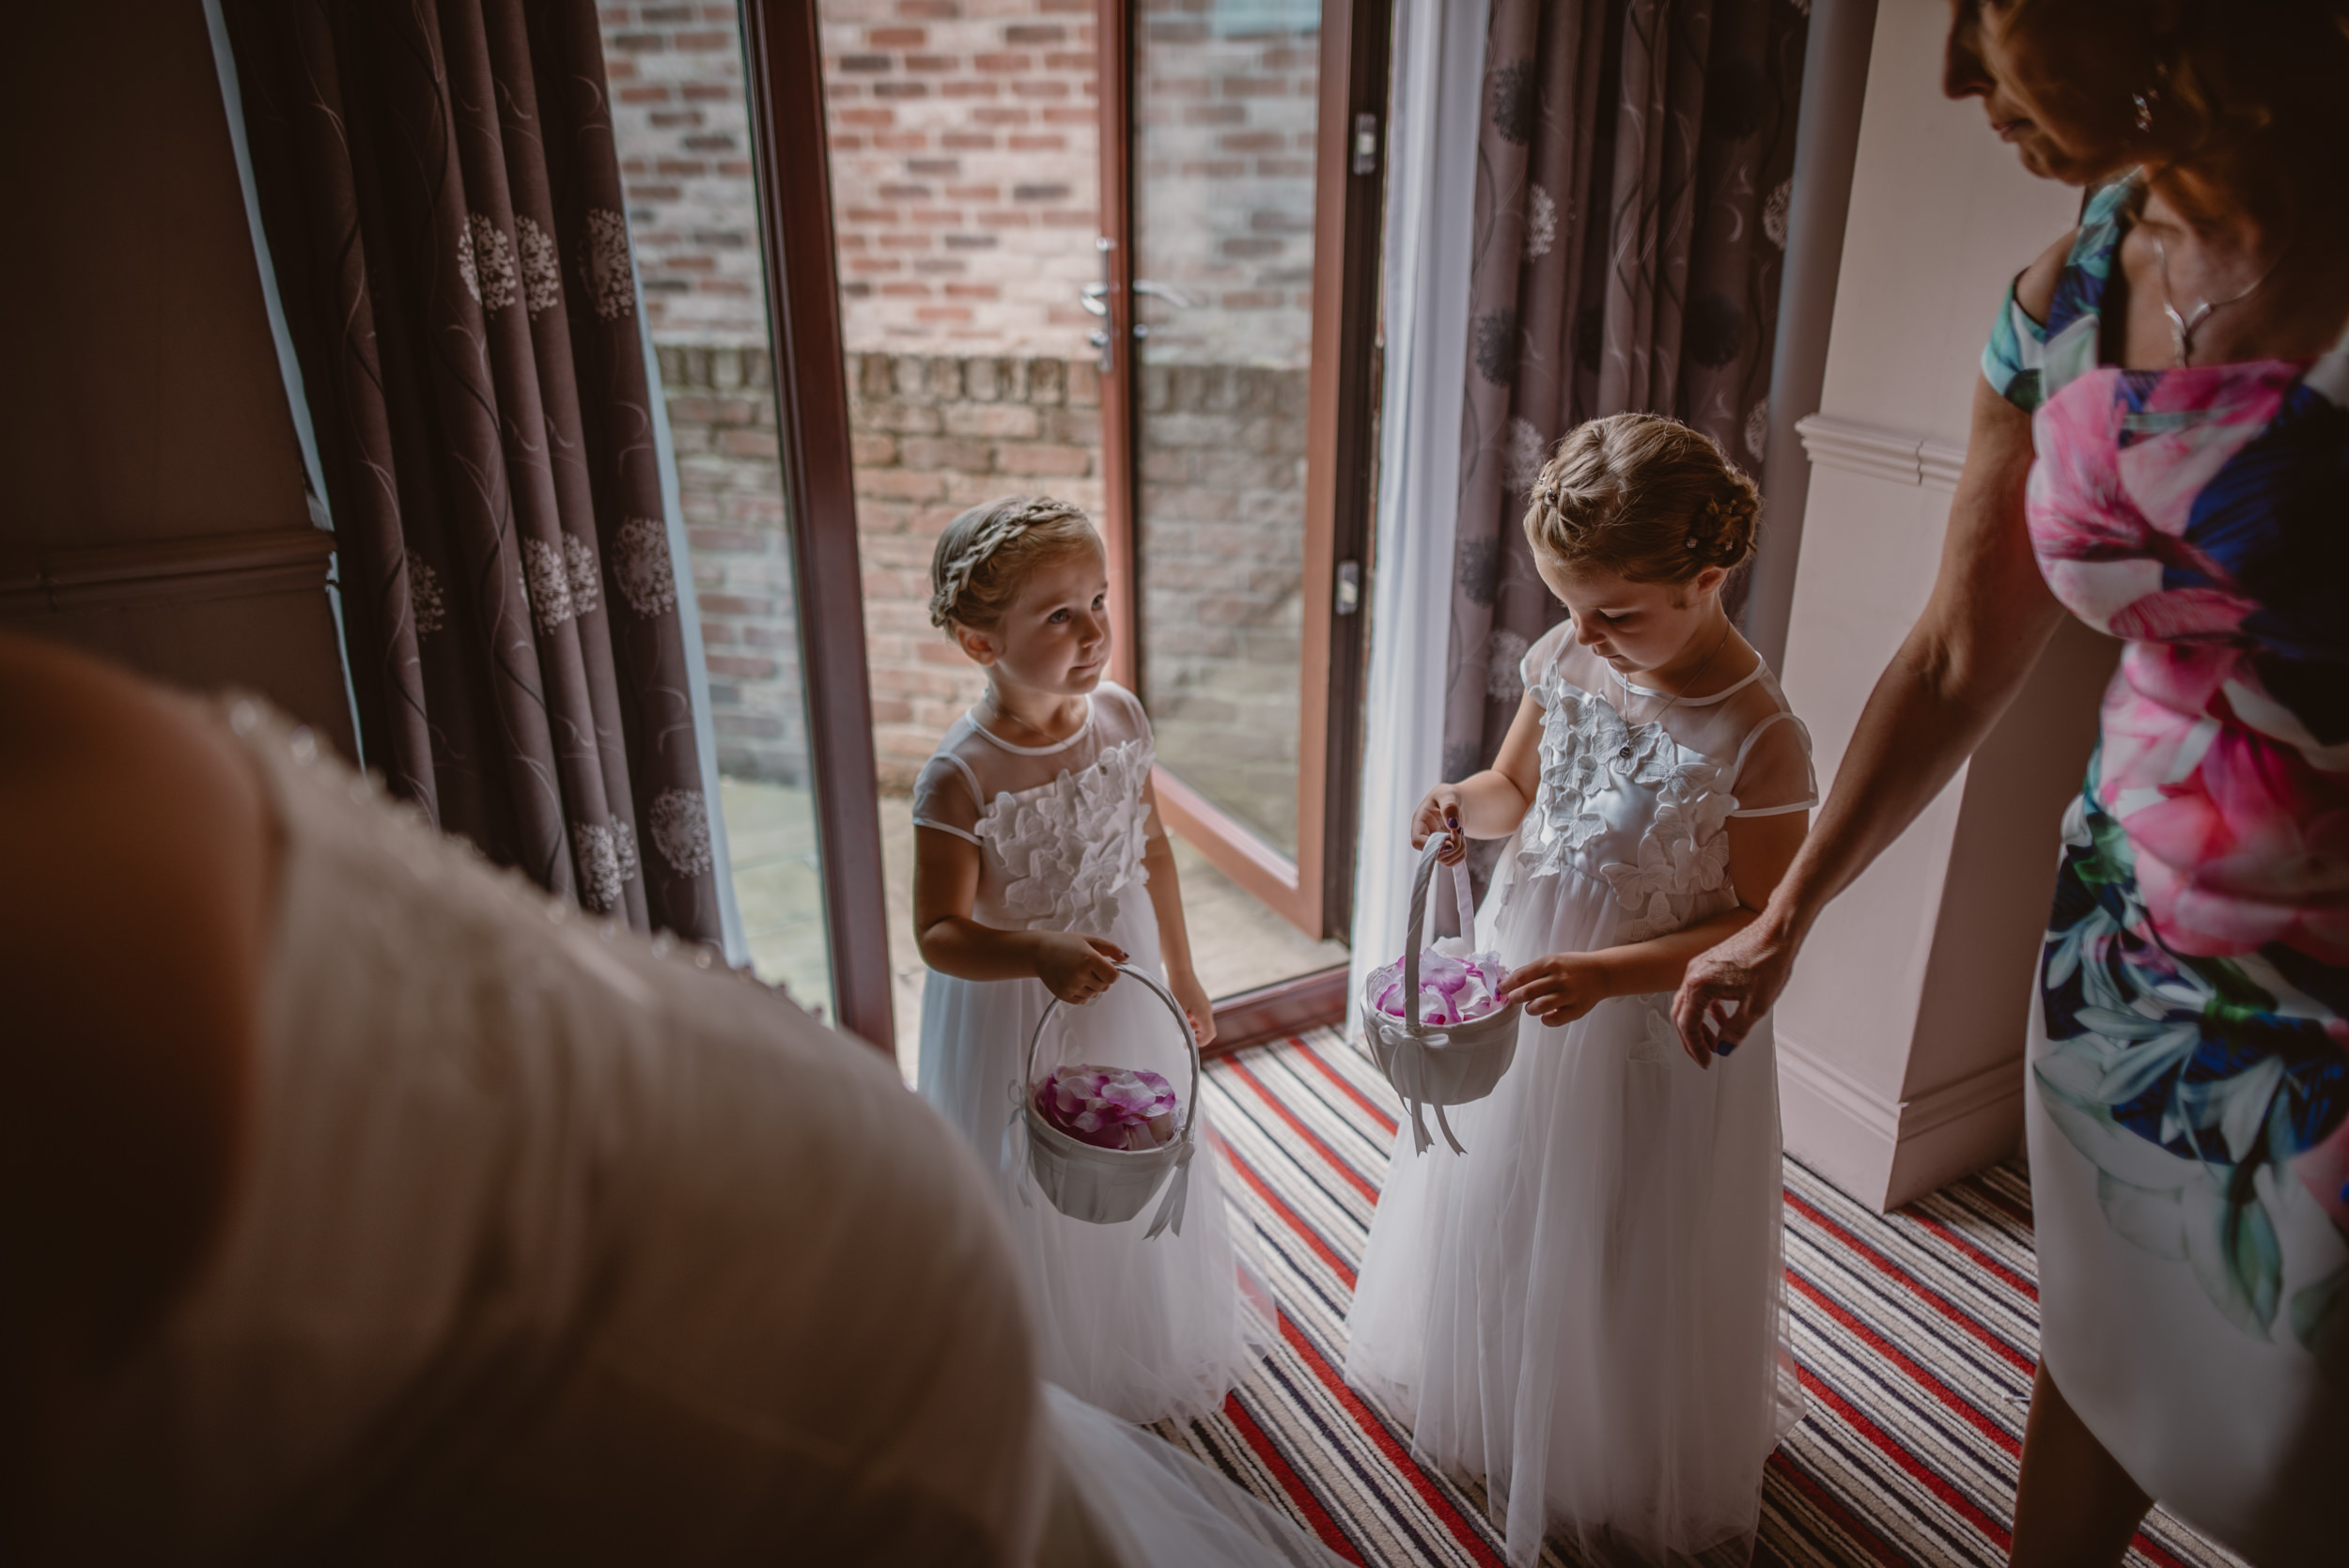 Chantelle-and-Stephen-Old-Thorns-Hotel-Wedding-Liphook-Manu-Mendoza-Wedding-Photography-132.jpg